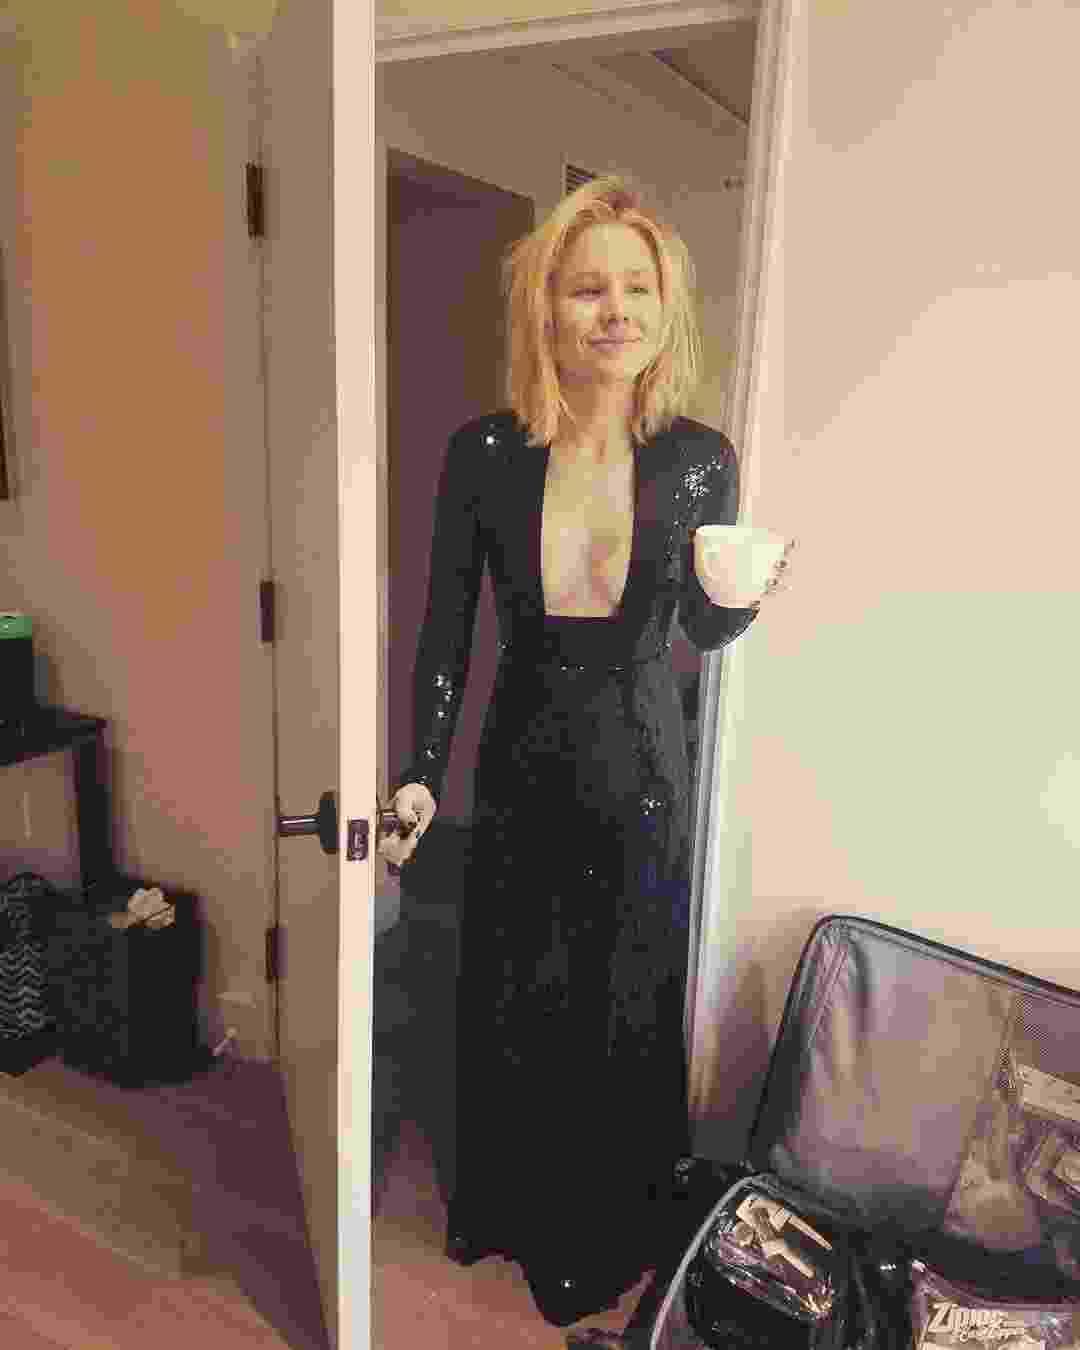 Preparativos: Kristen Bell - Reprodução/Instagram